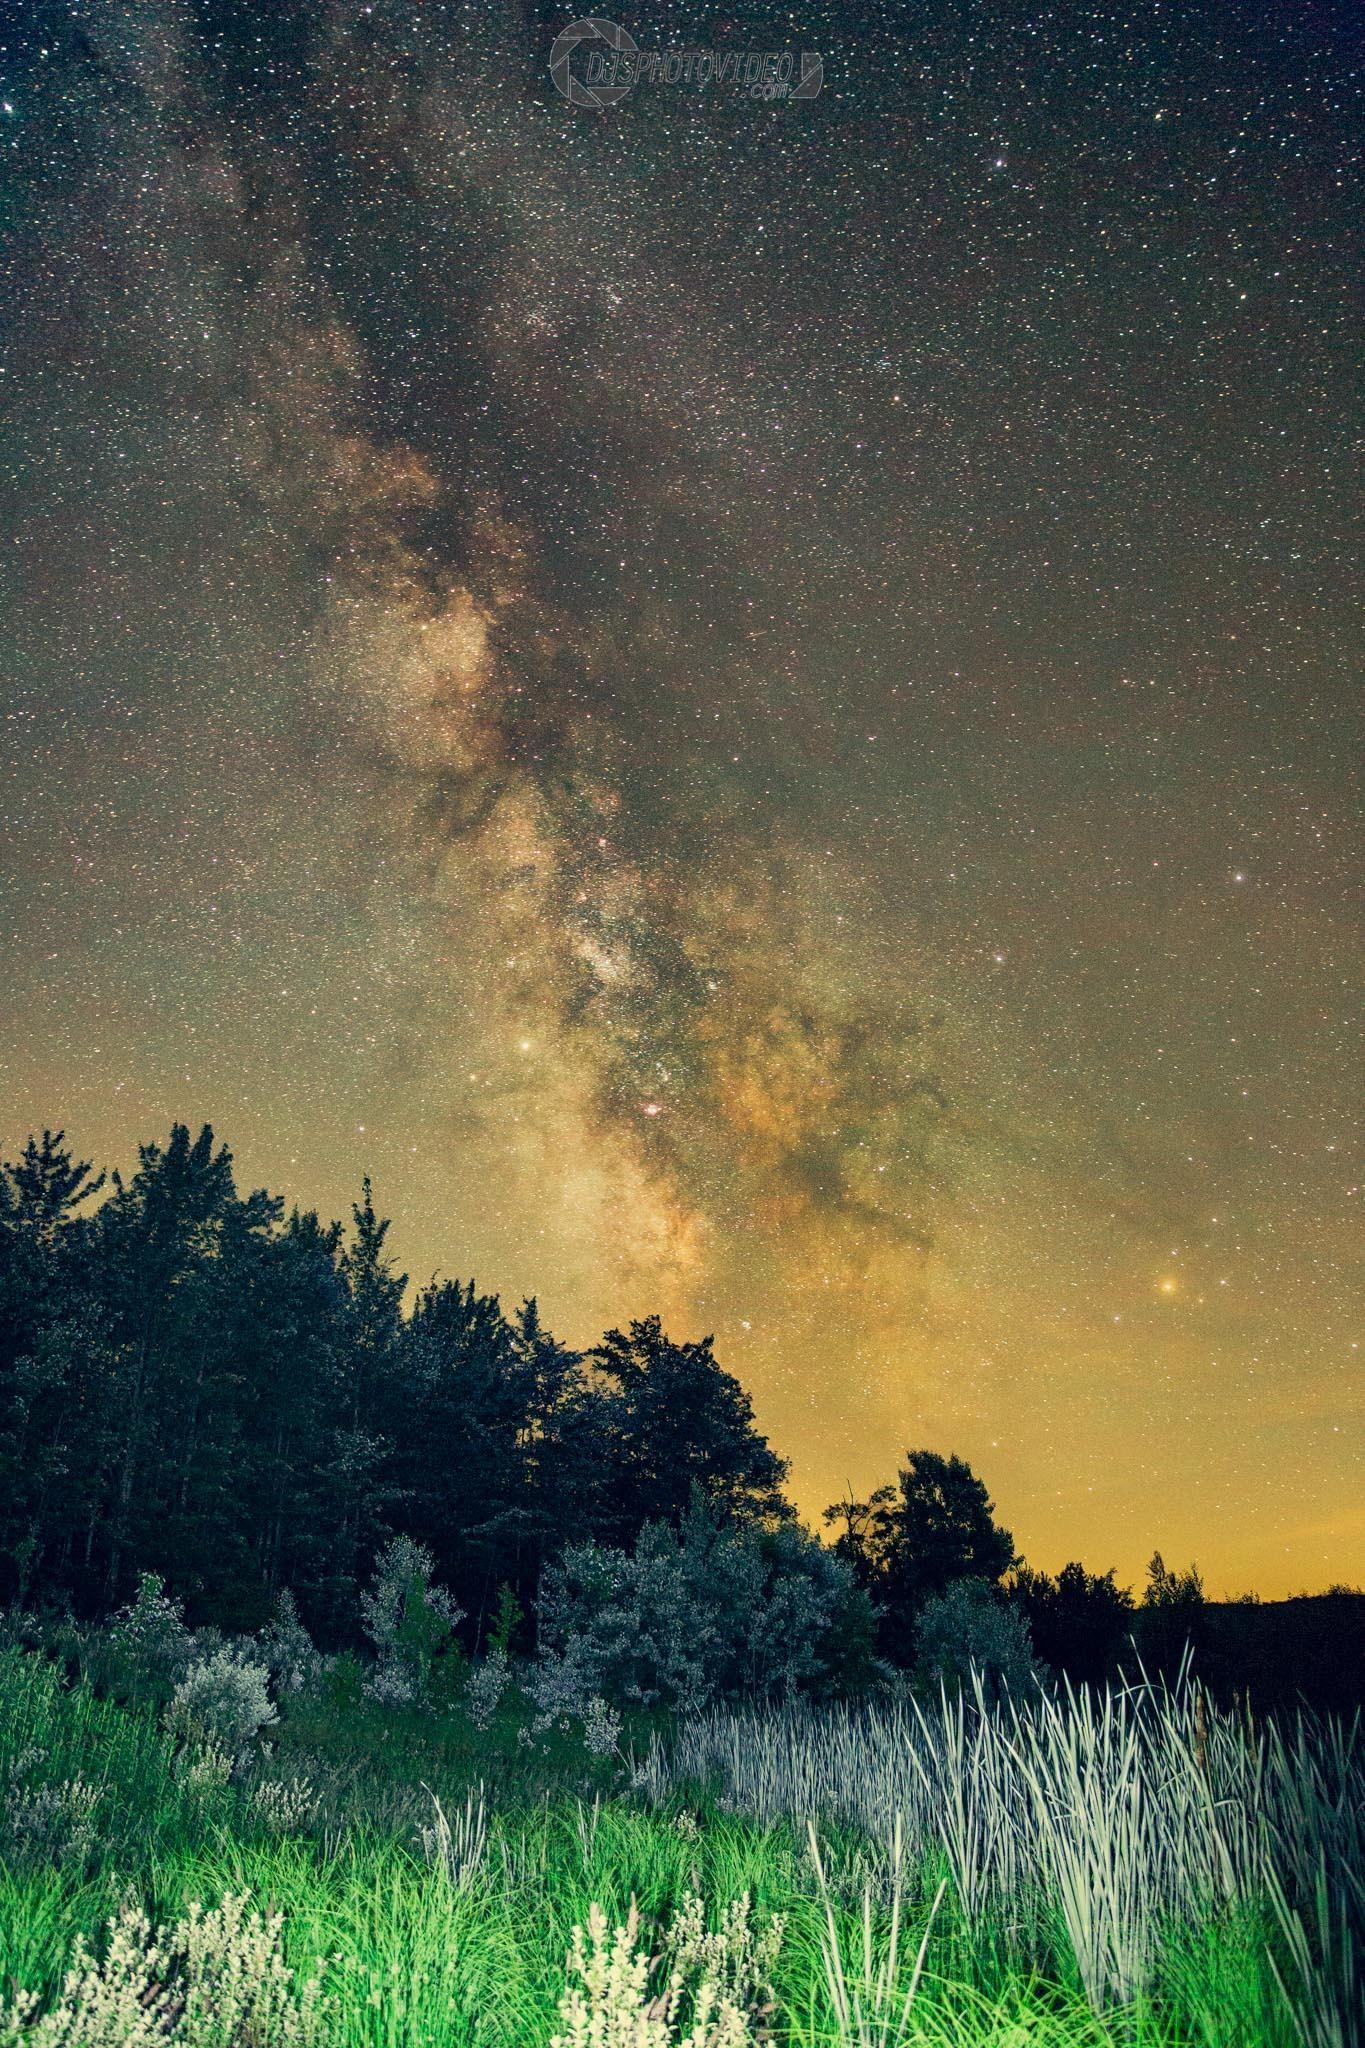 Landscape Night Scenery